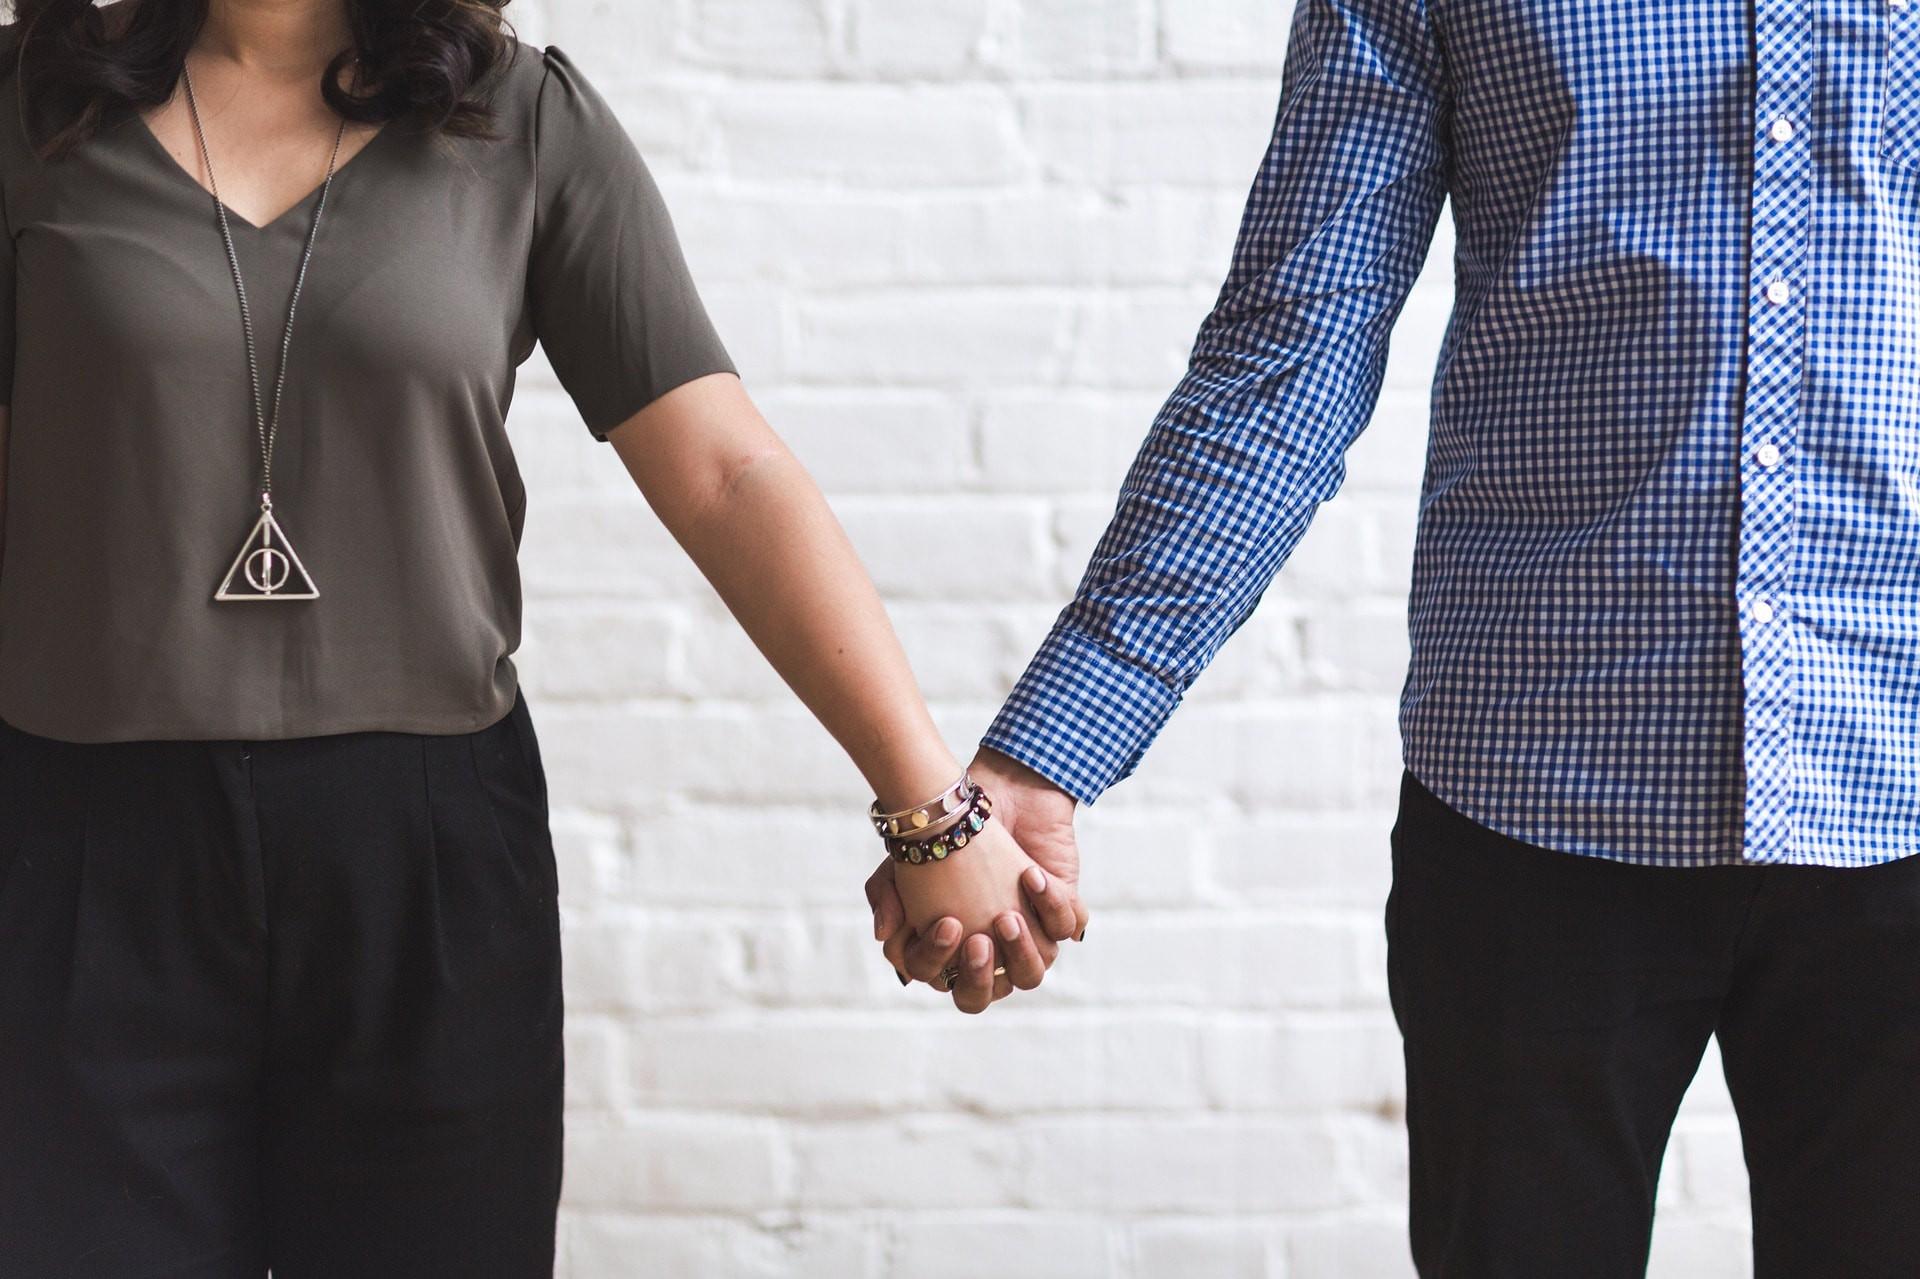 Christliche uk-Dating-Website